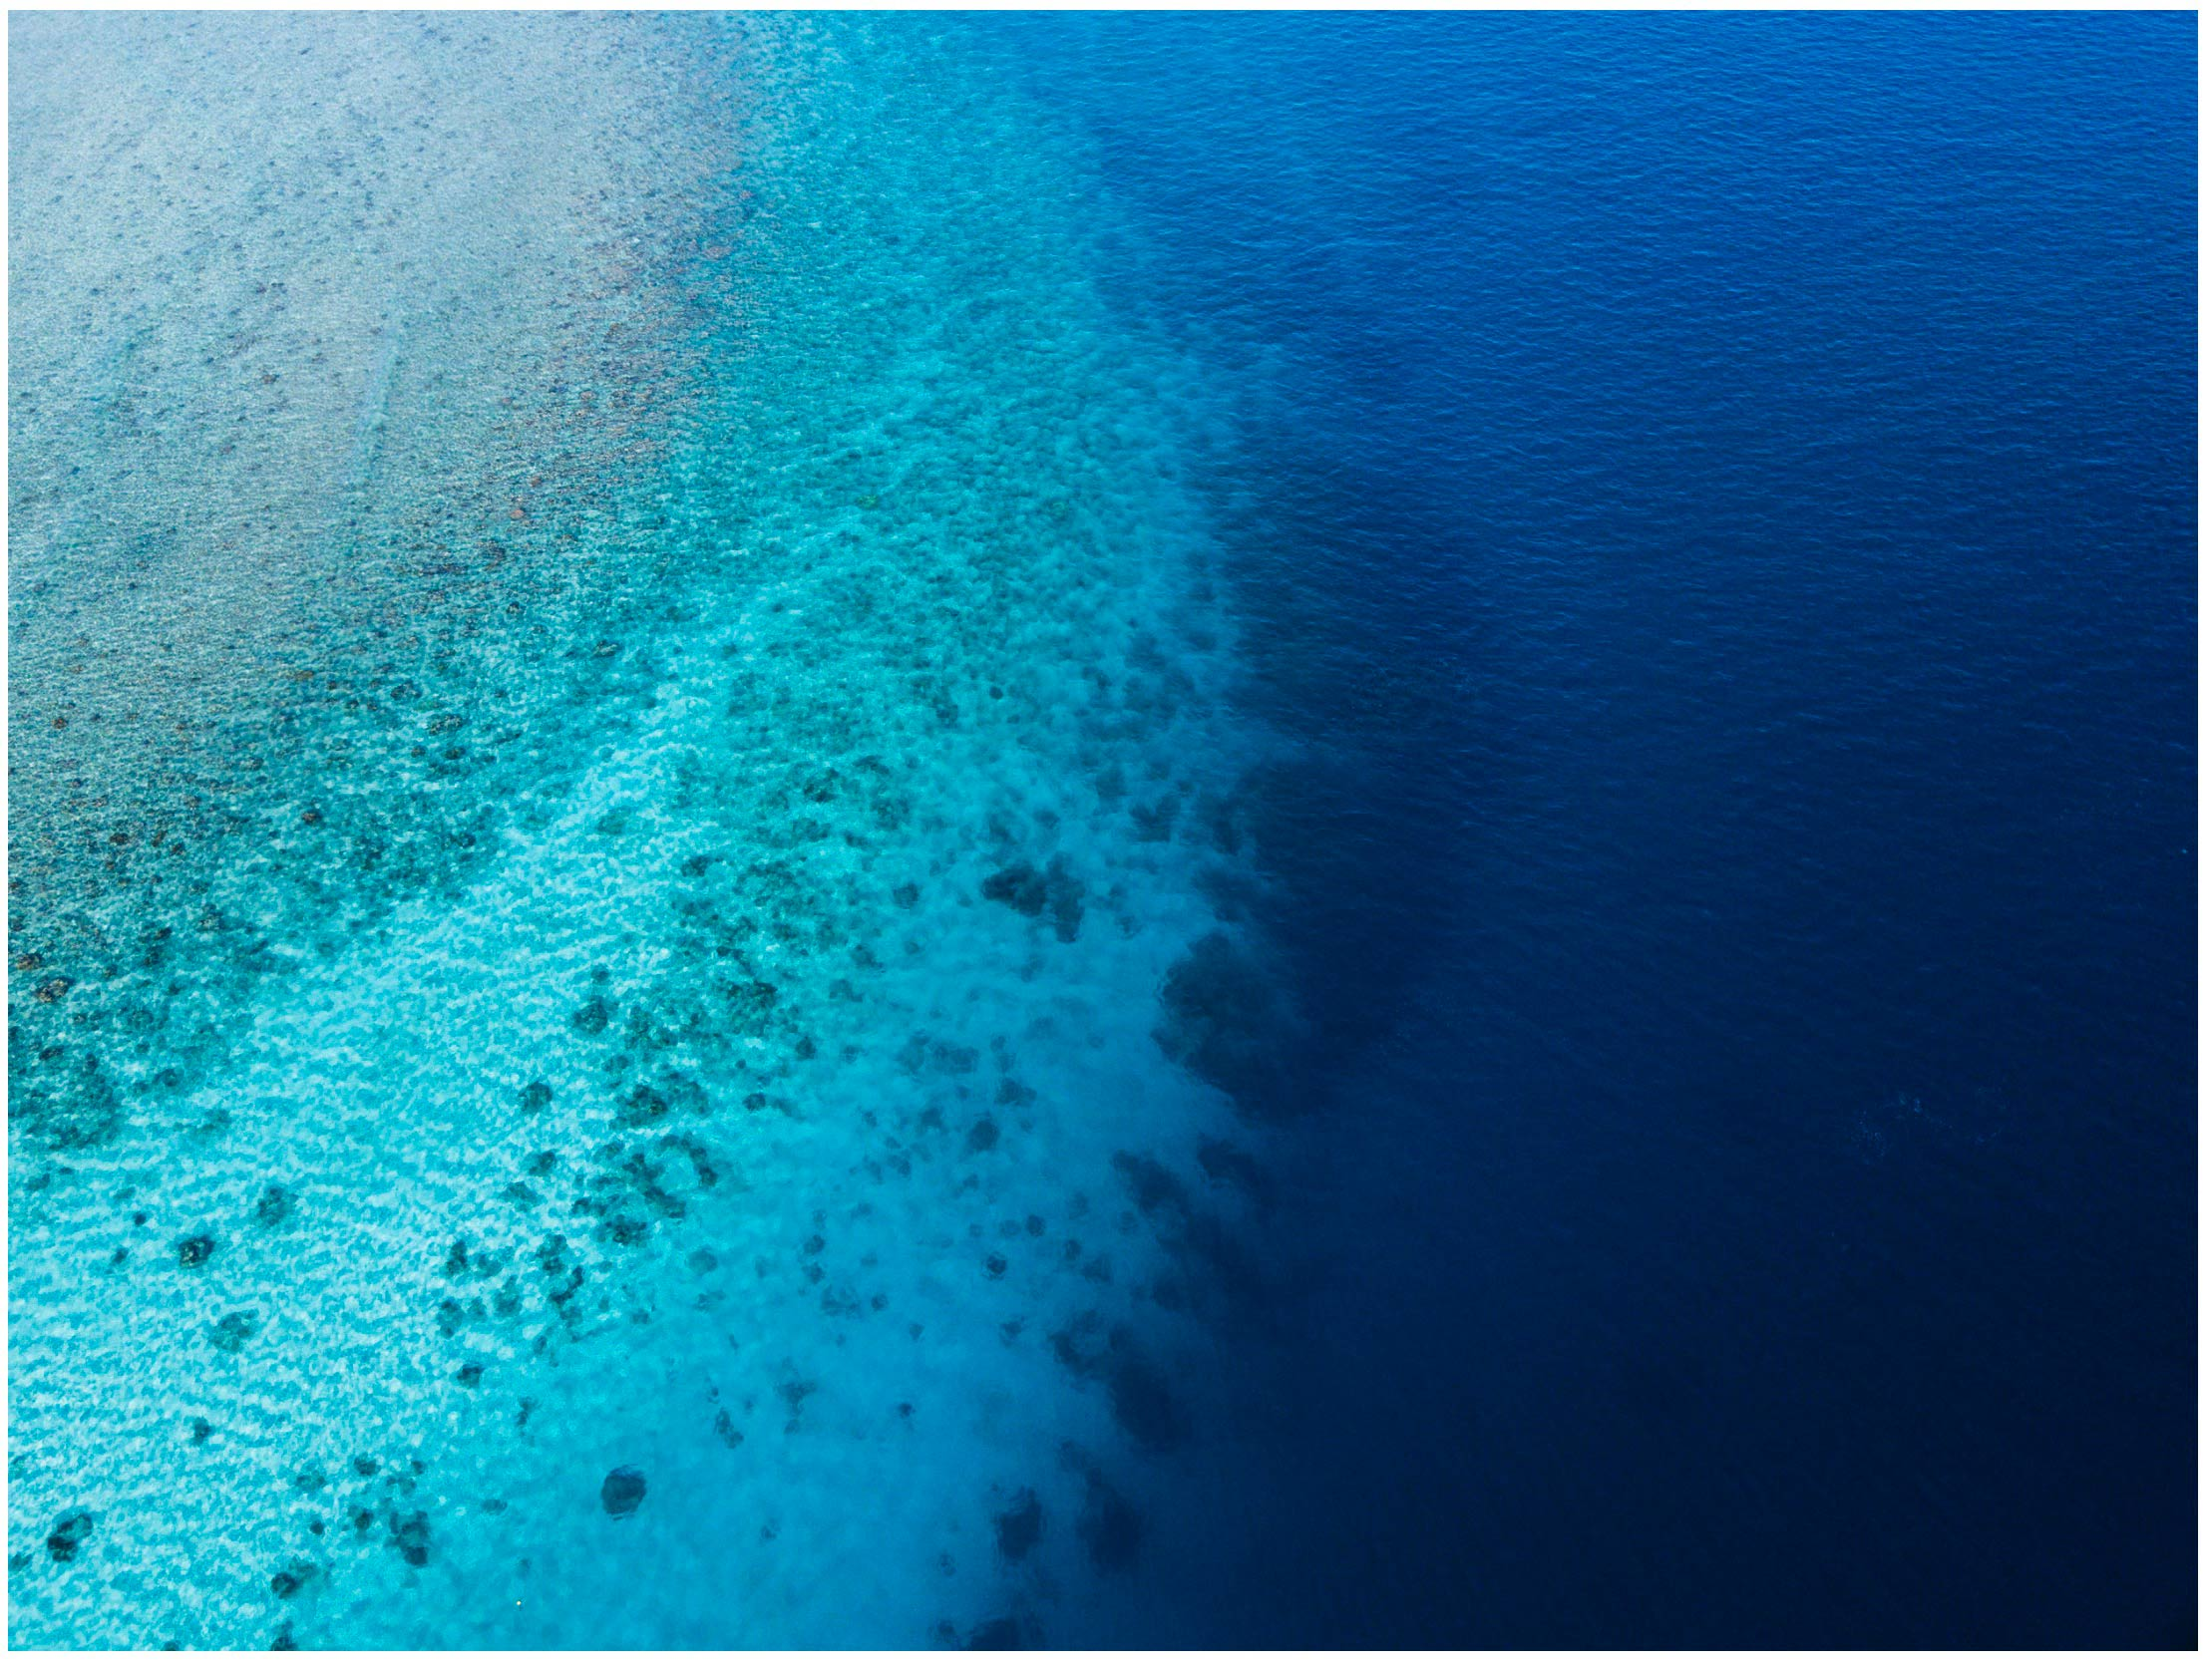 rodd-owen-ocean-surf-photography-for-sale-113.jpg